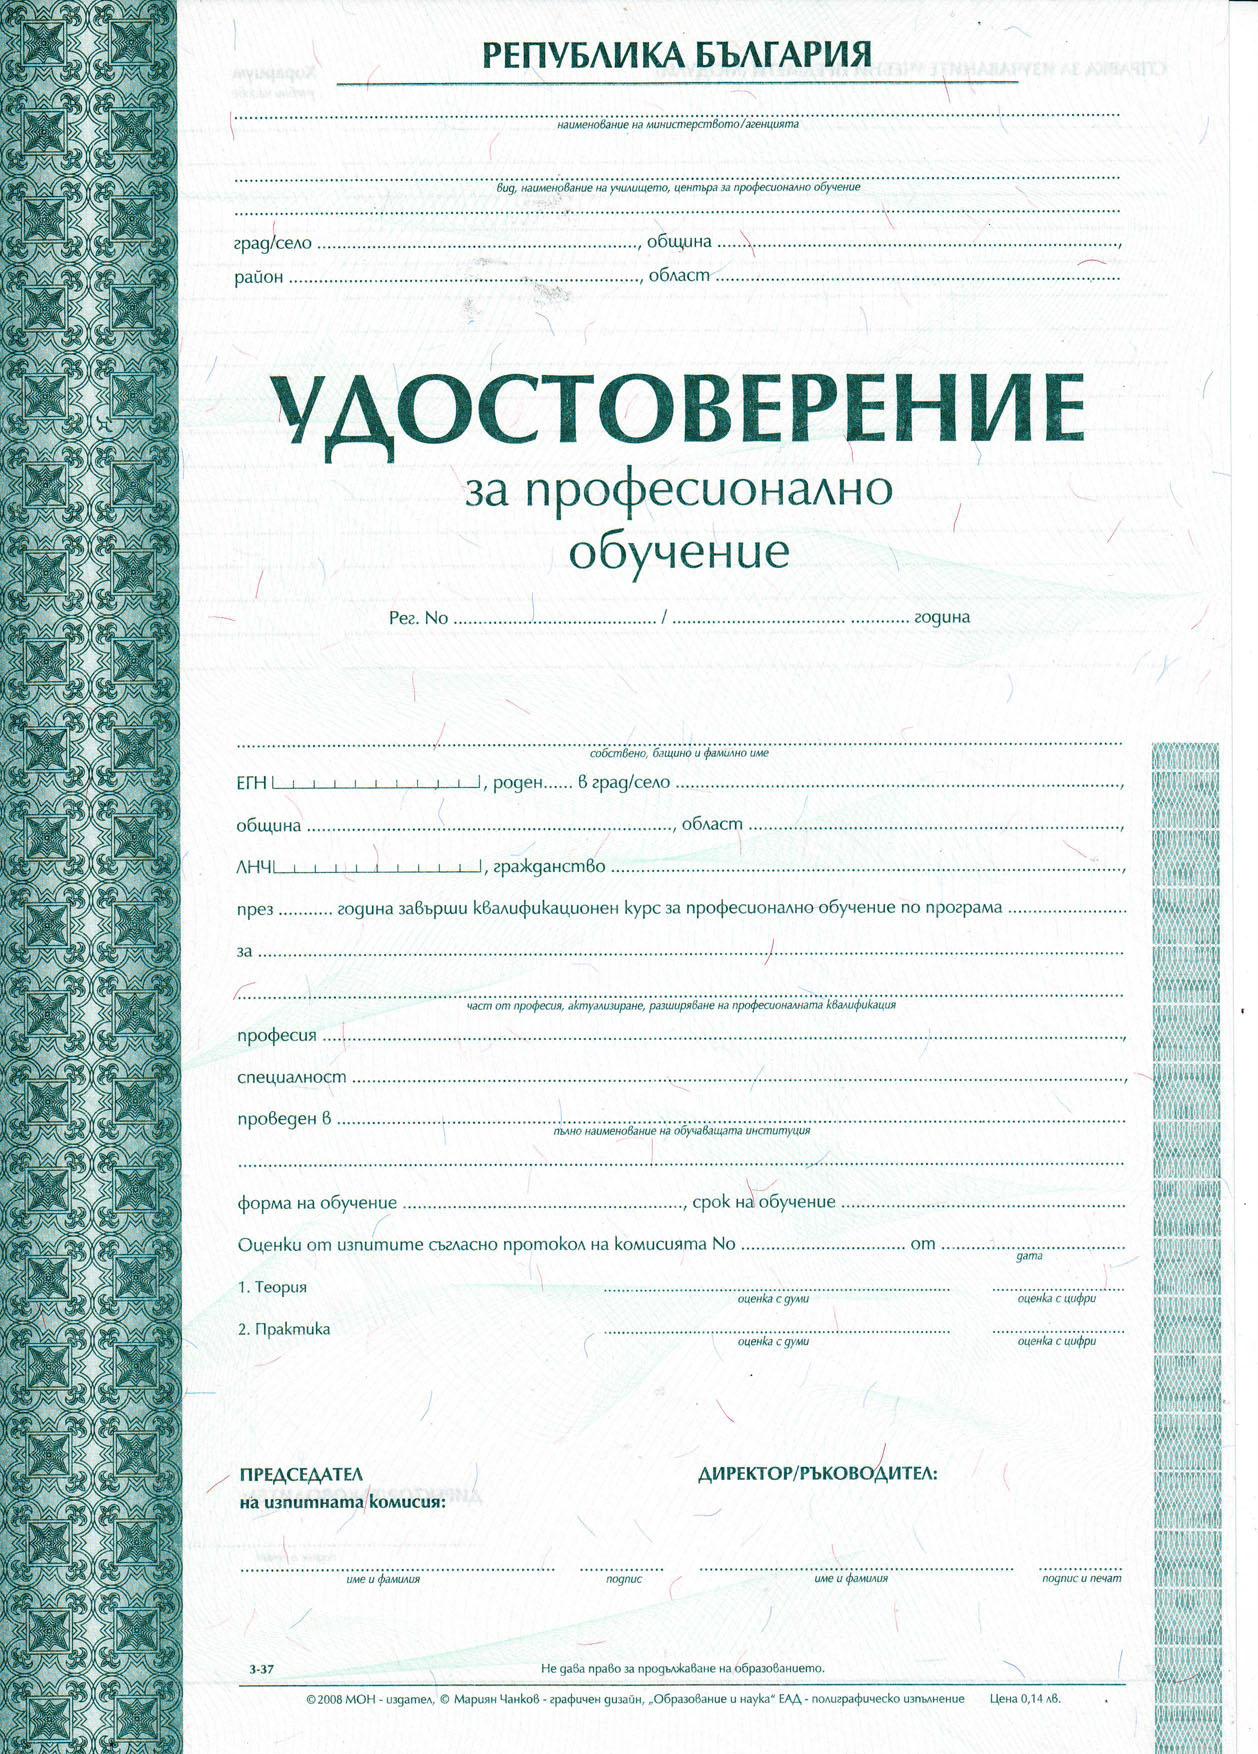 Държавно удостоверение